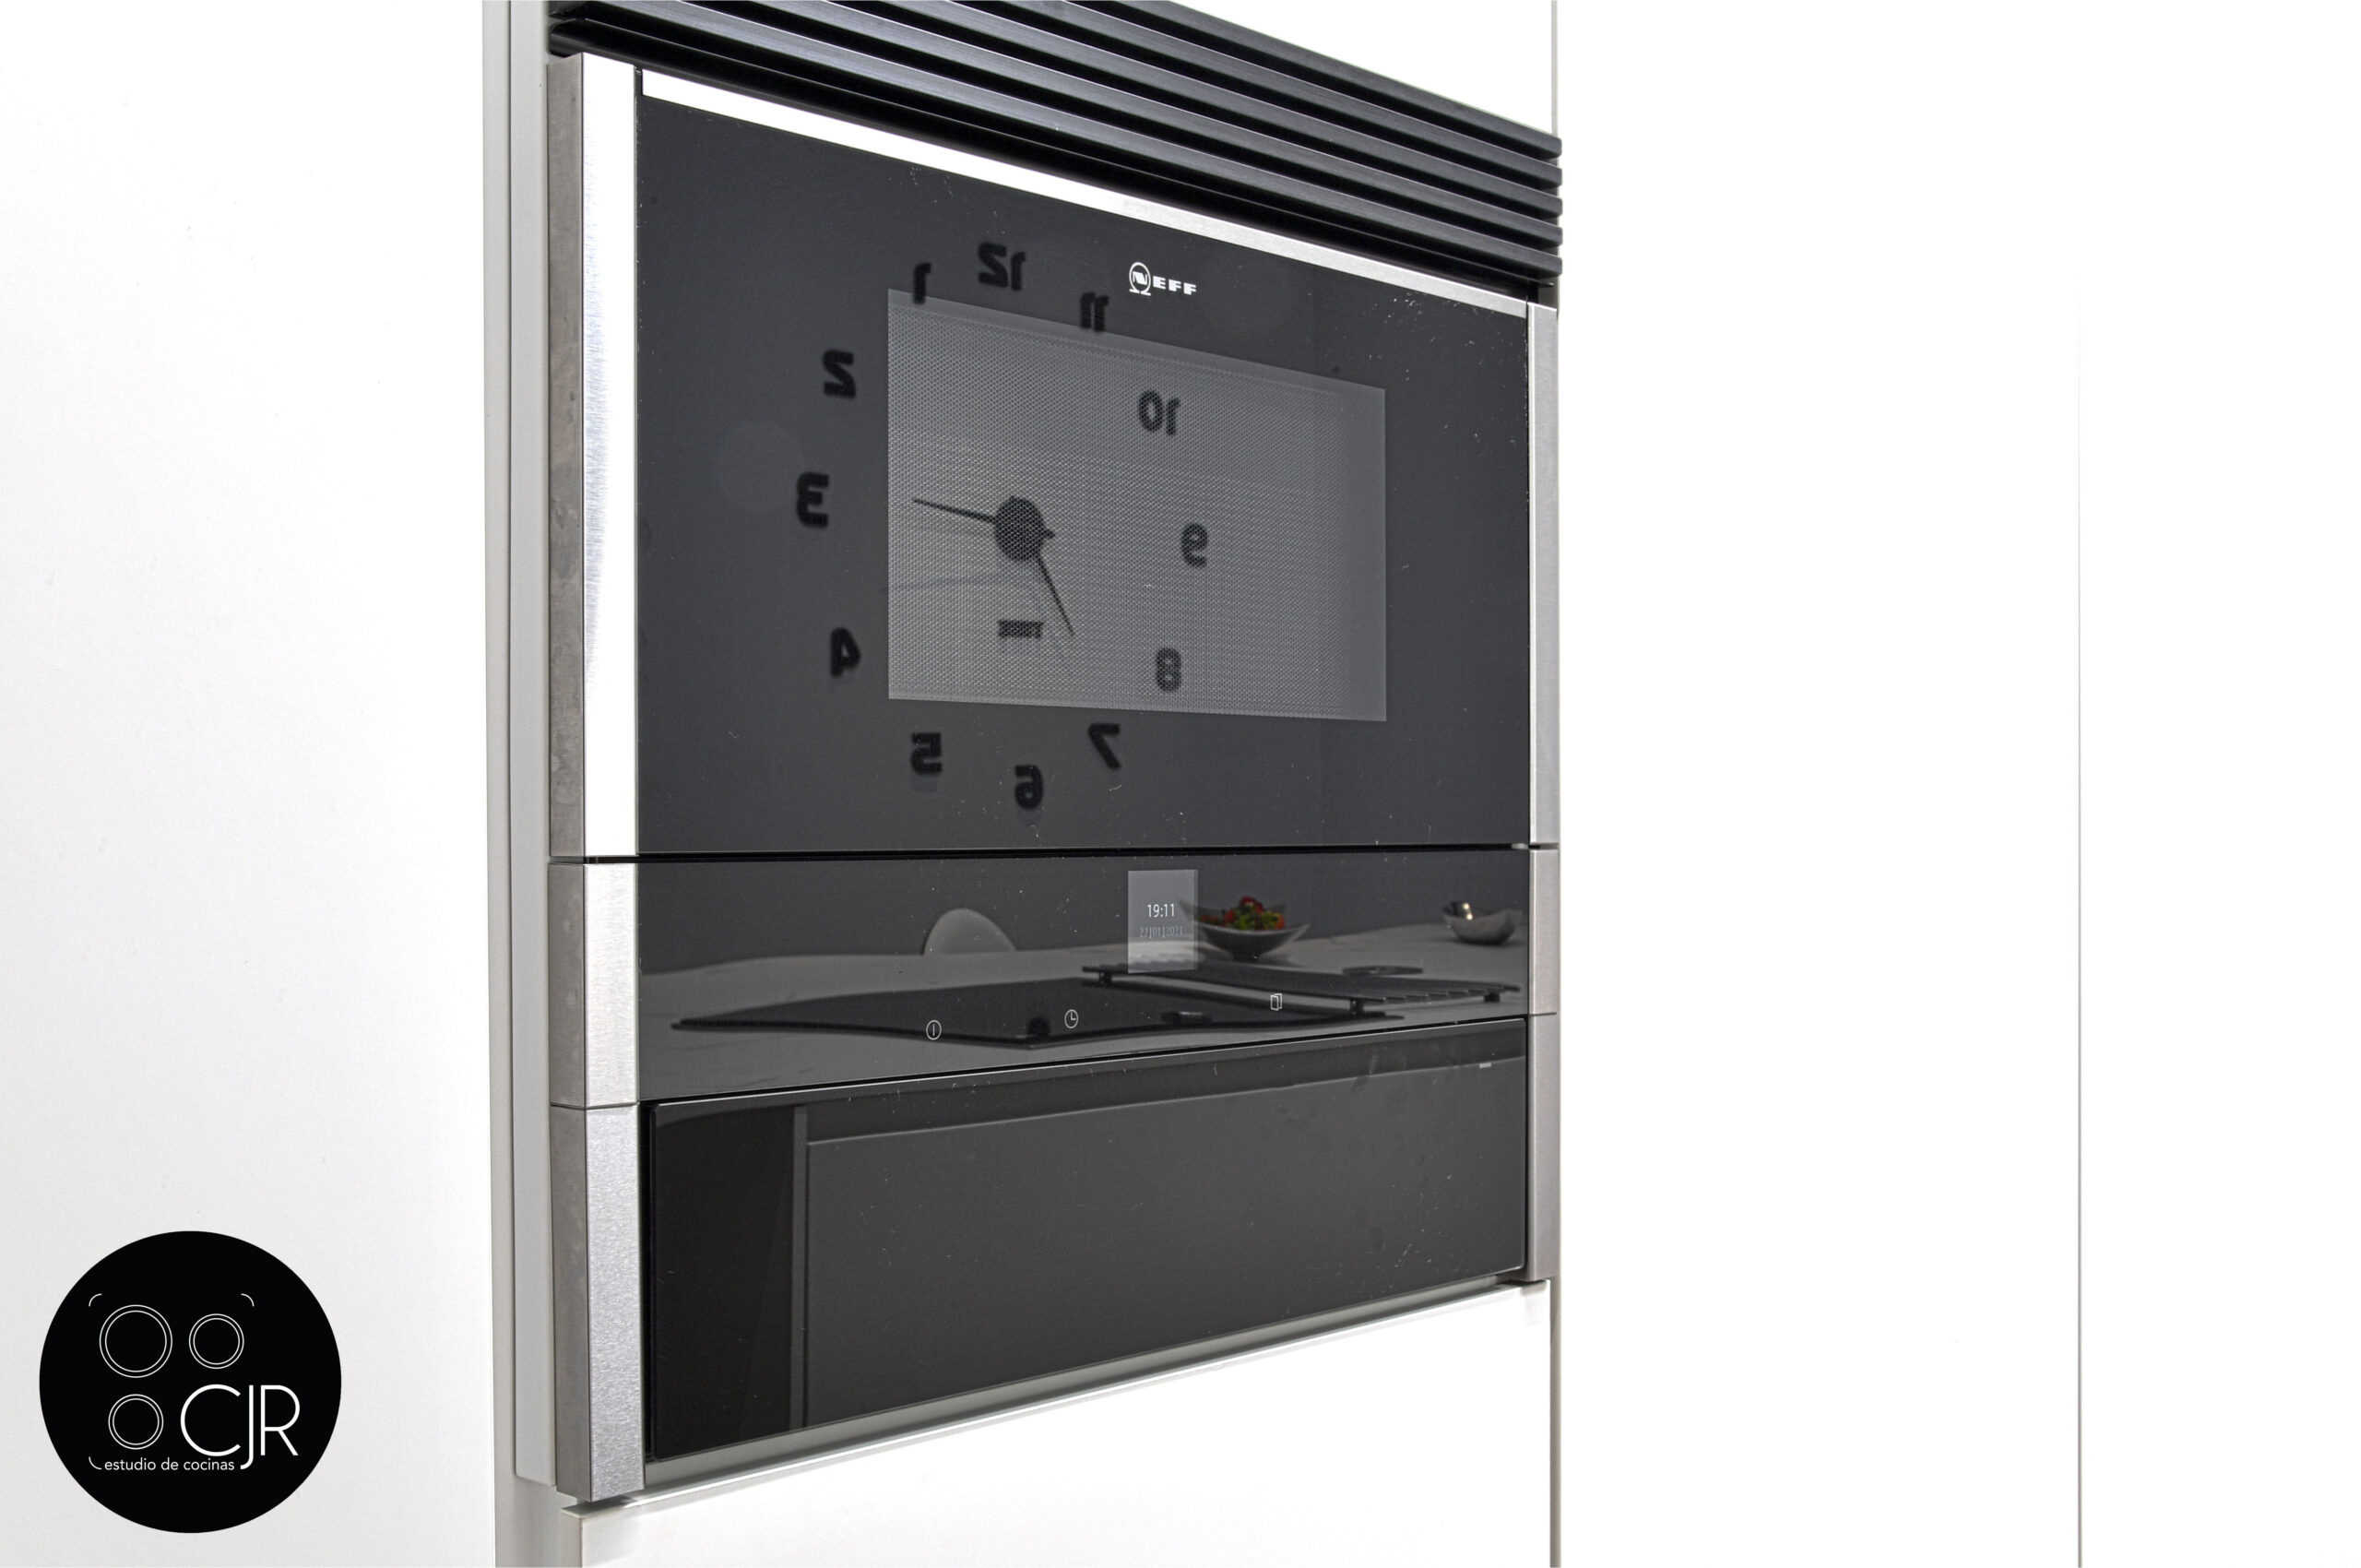 Zona electrodomésticos en la cocina blanca mate sin tiradores